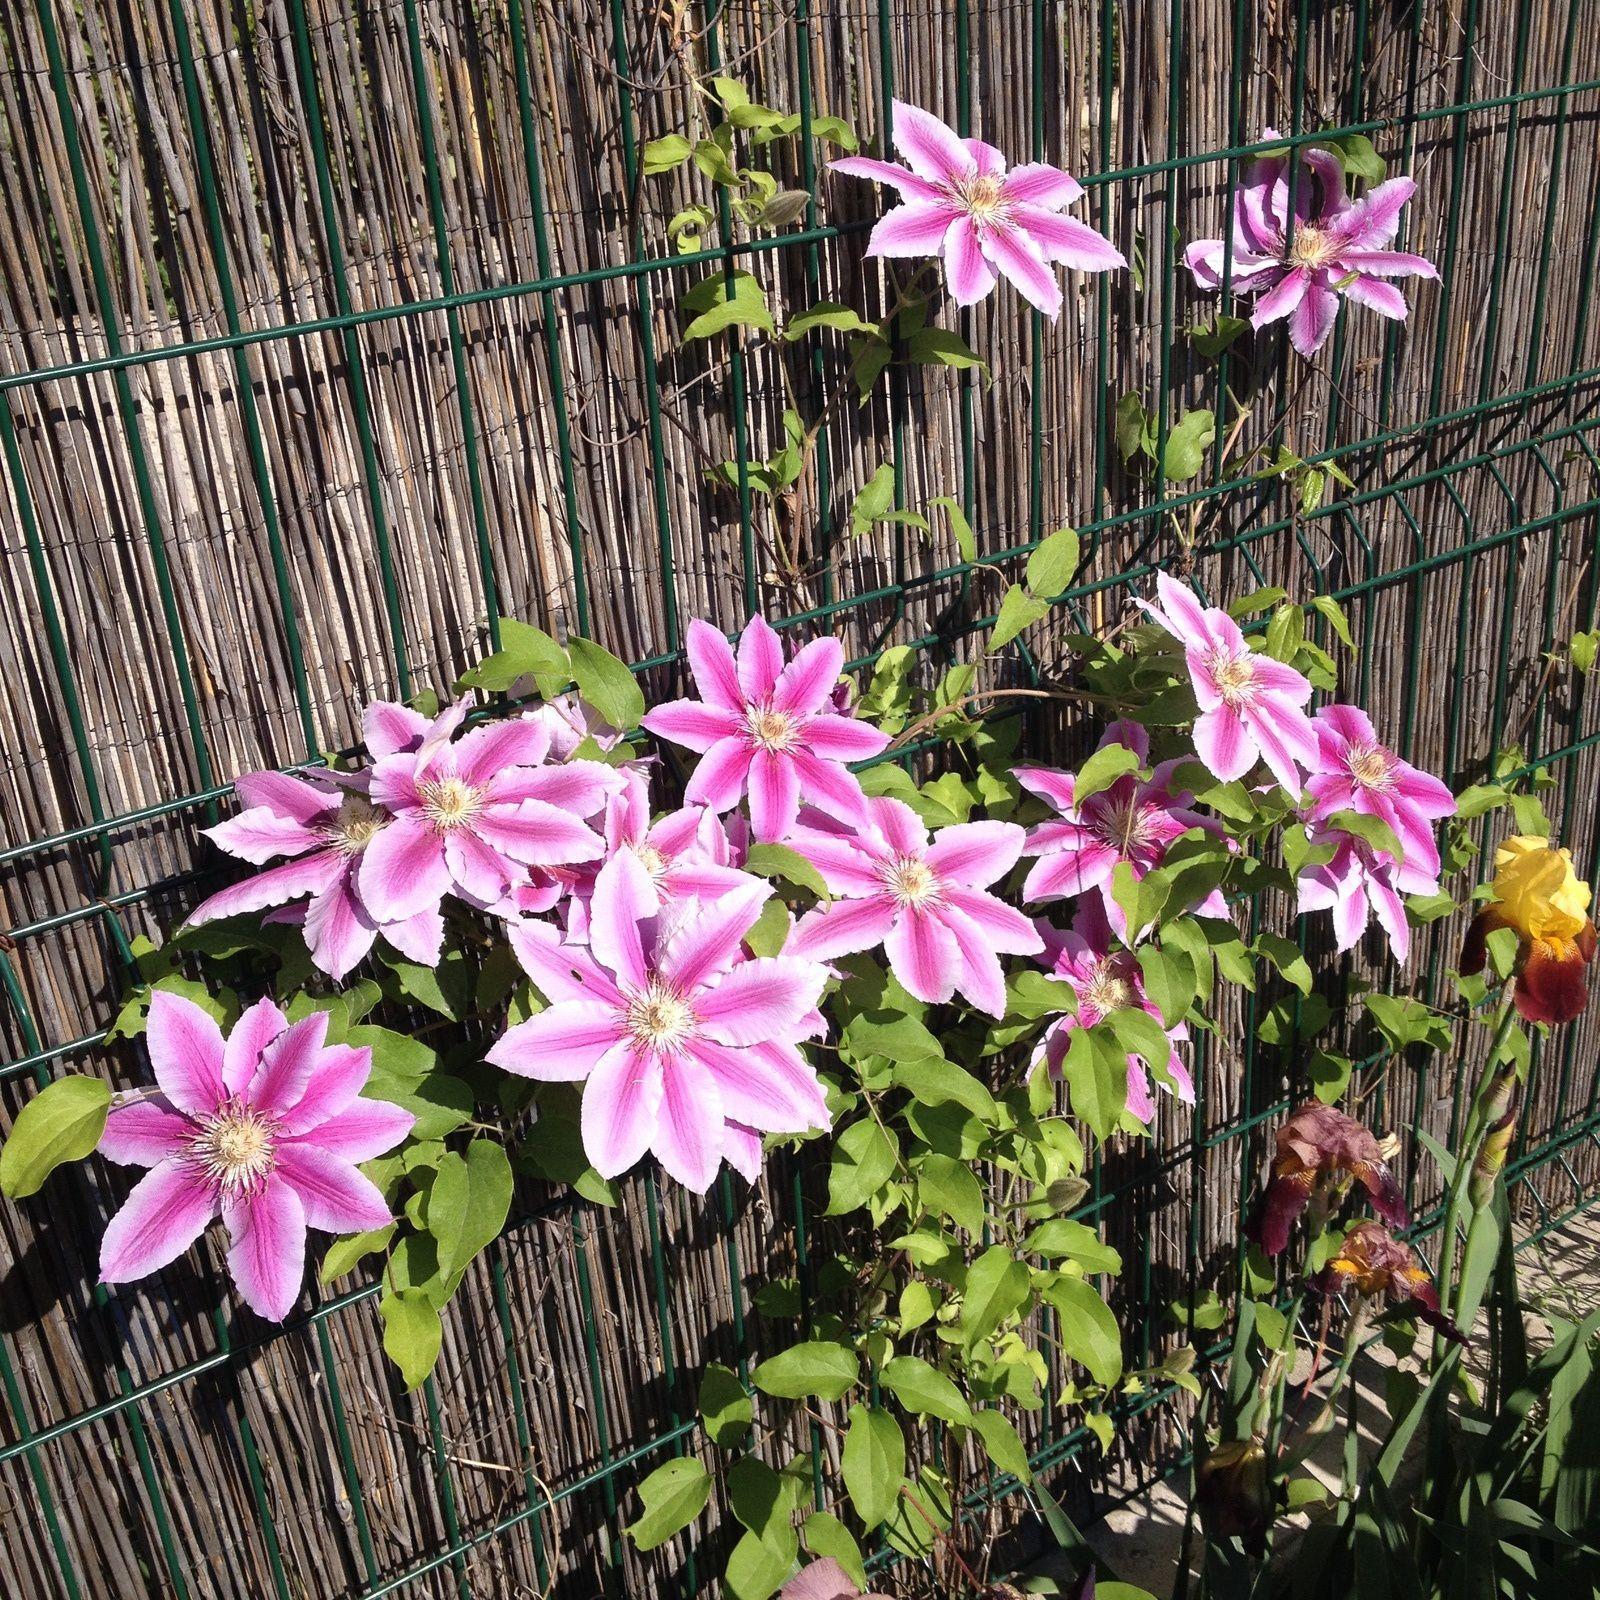 10. S'extasier sur notre jardin qui fleuri